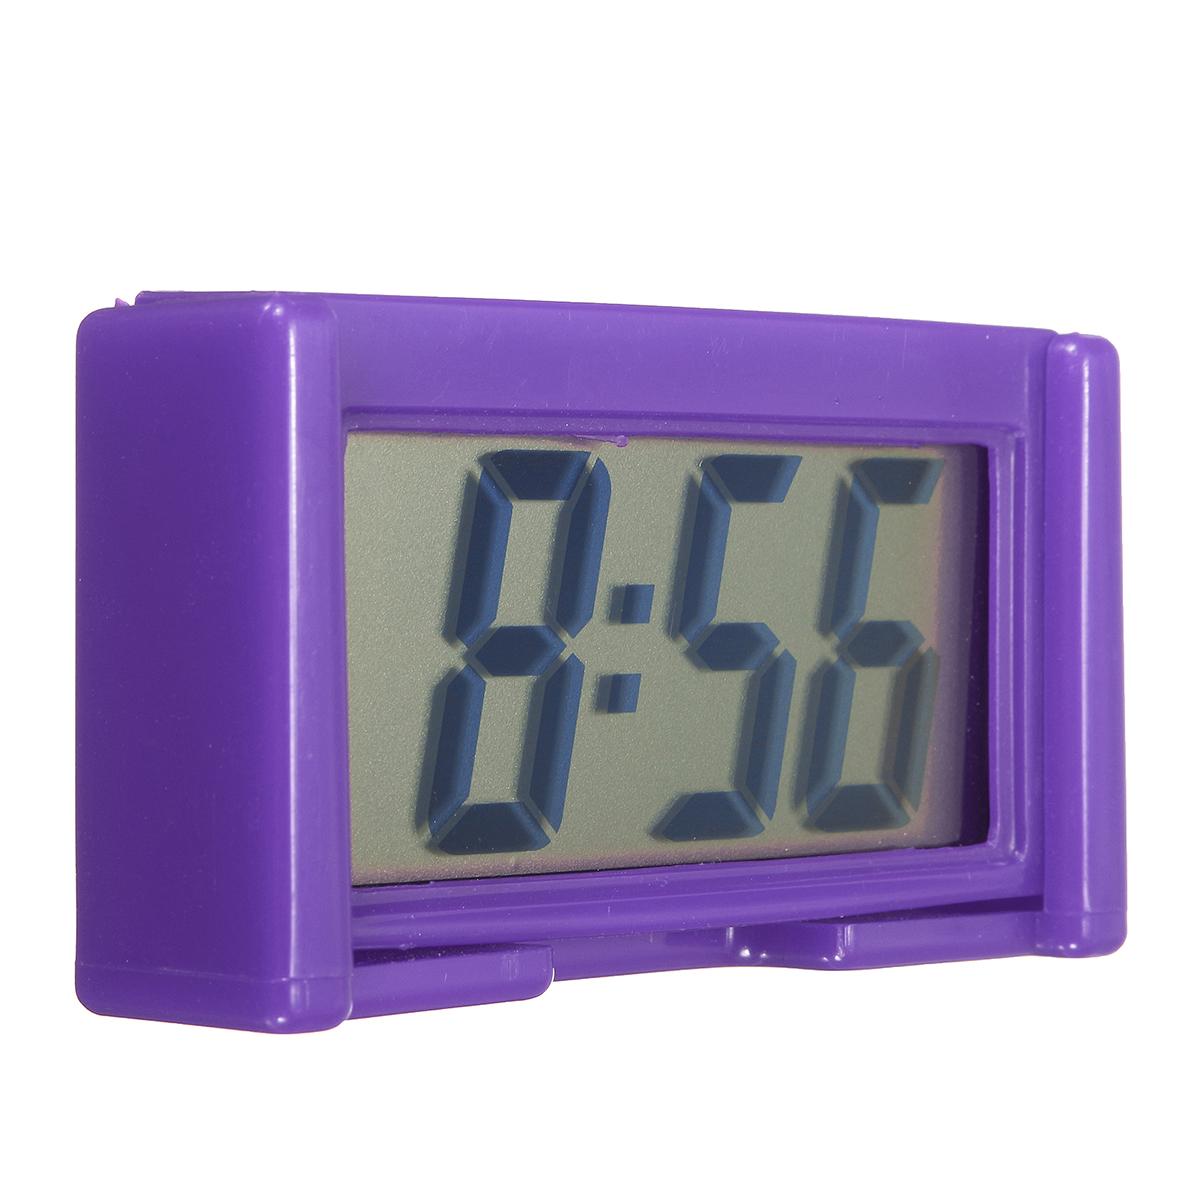 4 Colors Automotive Digital Car Lcd Clock Self Adhesive